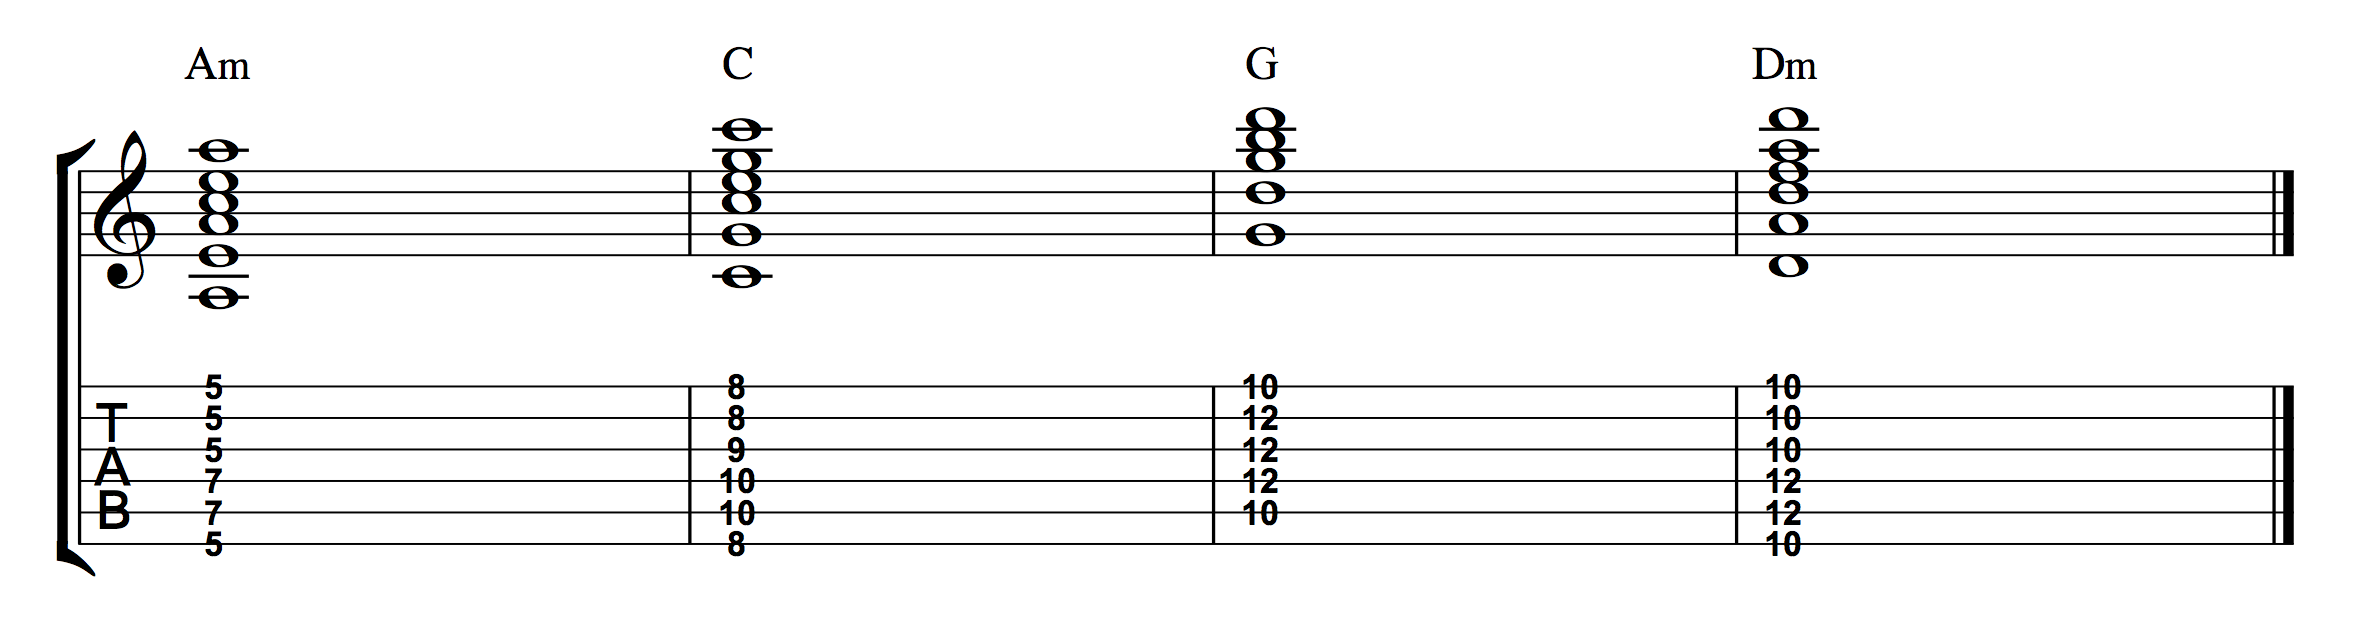 Chord Ex 2 - Demo 4